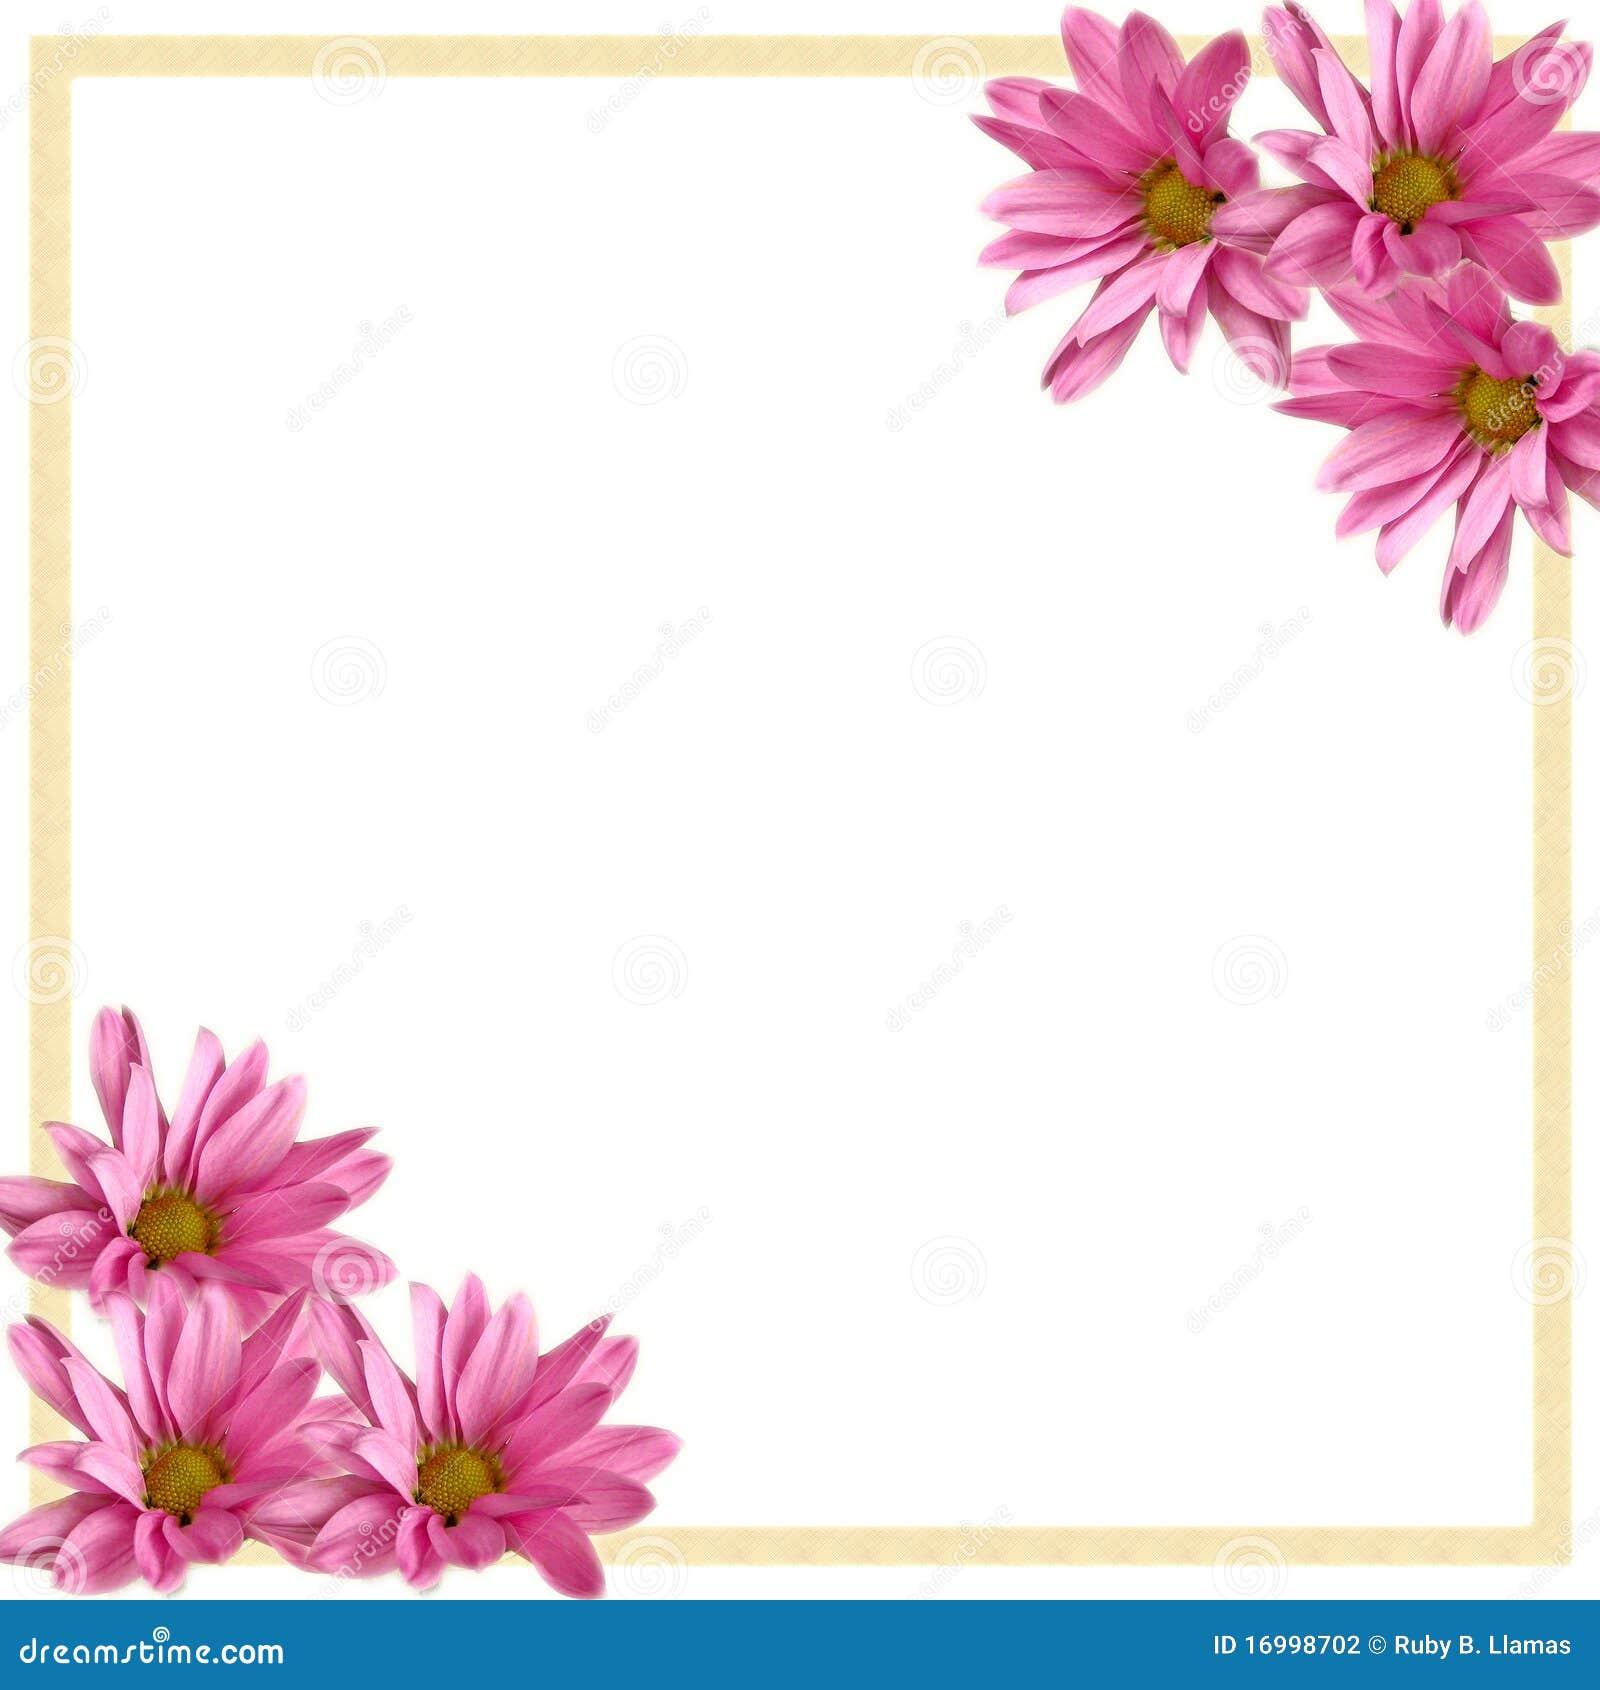 Pink Daisies Corner Border on White